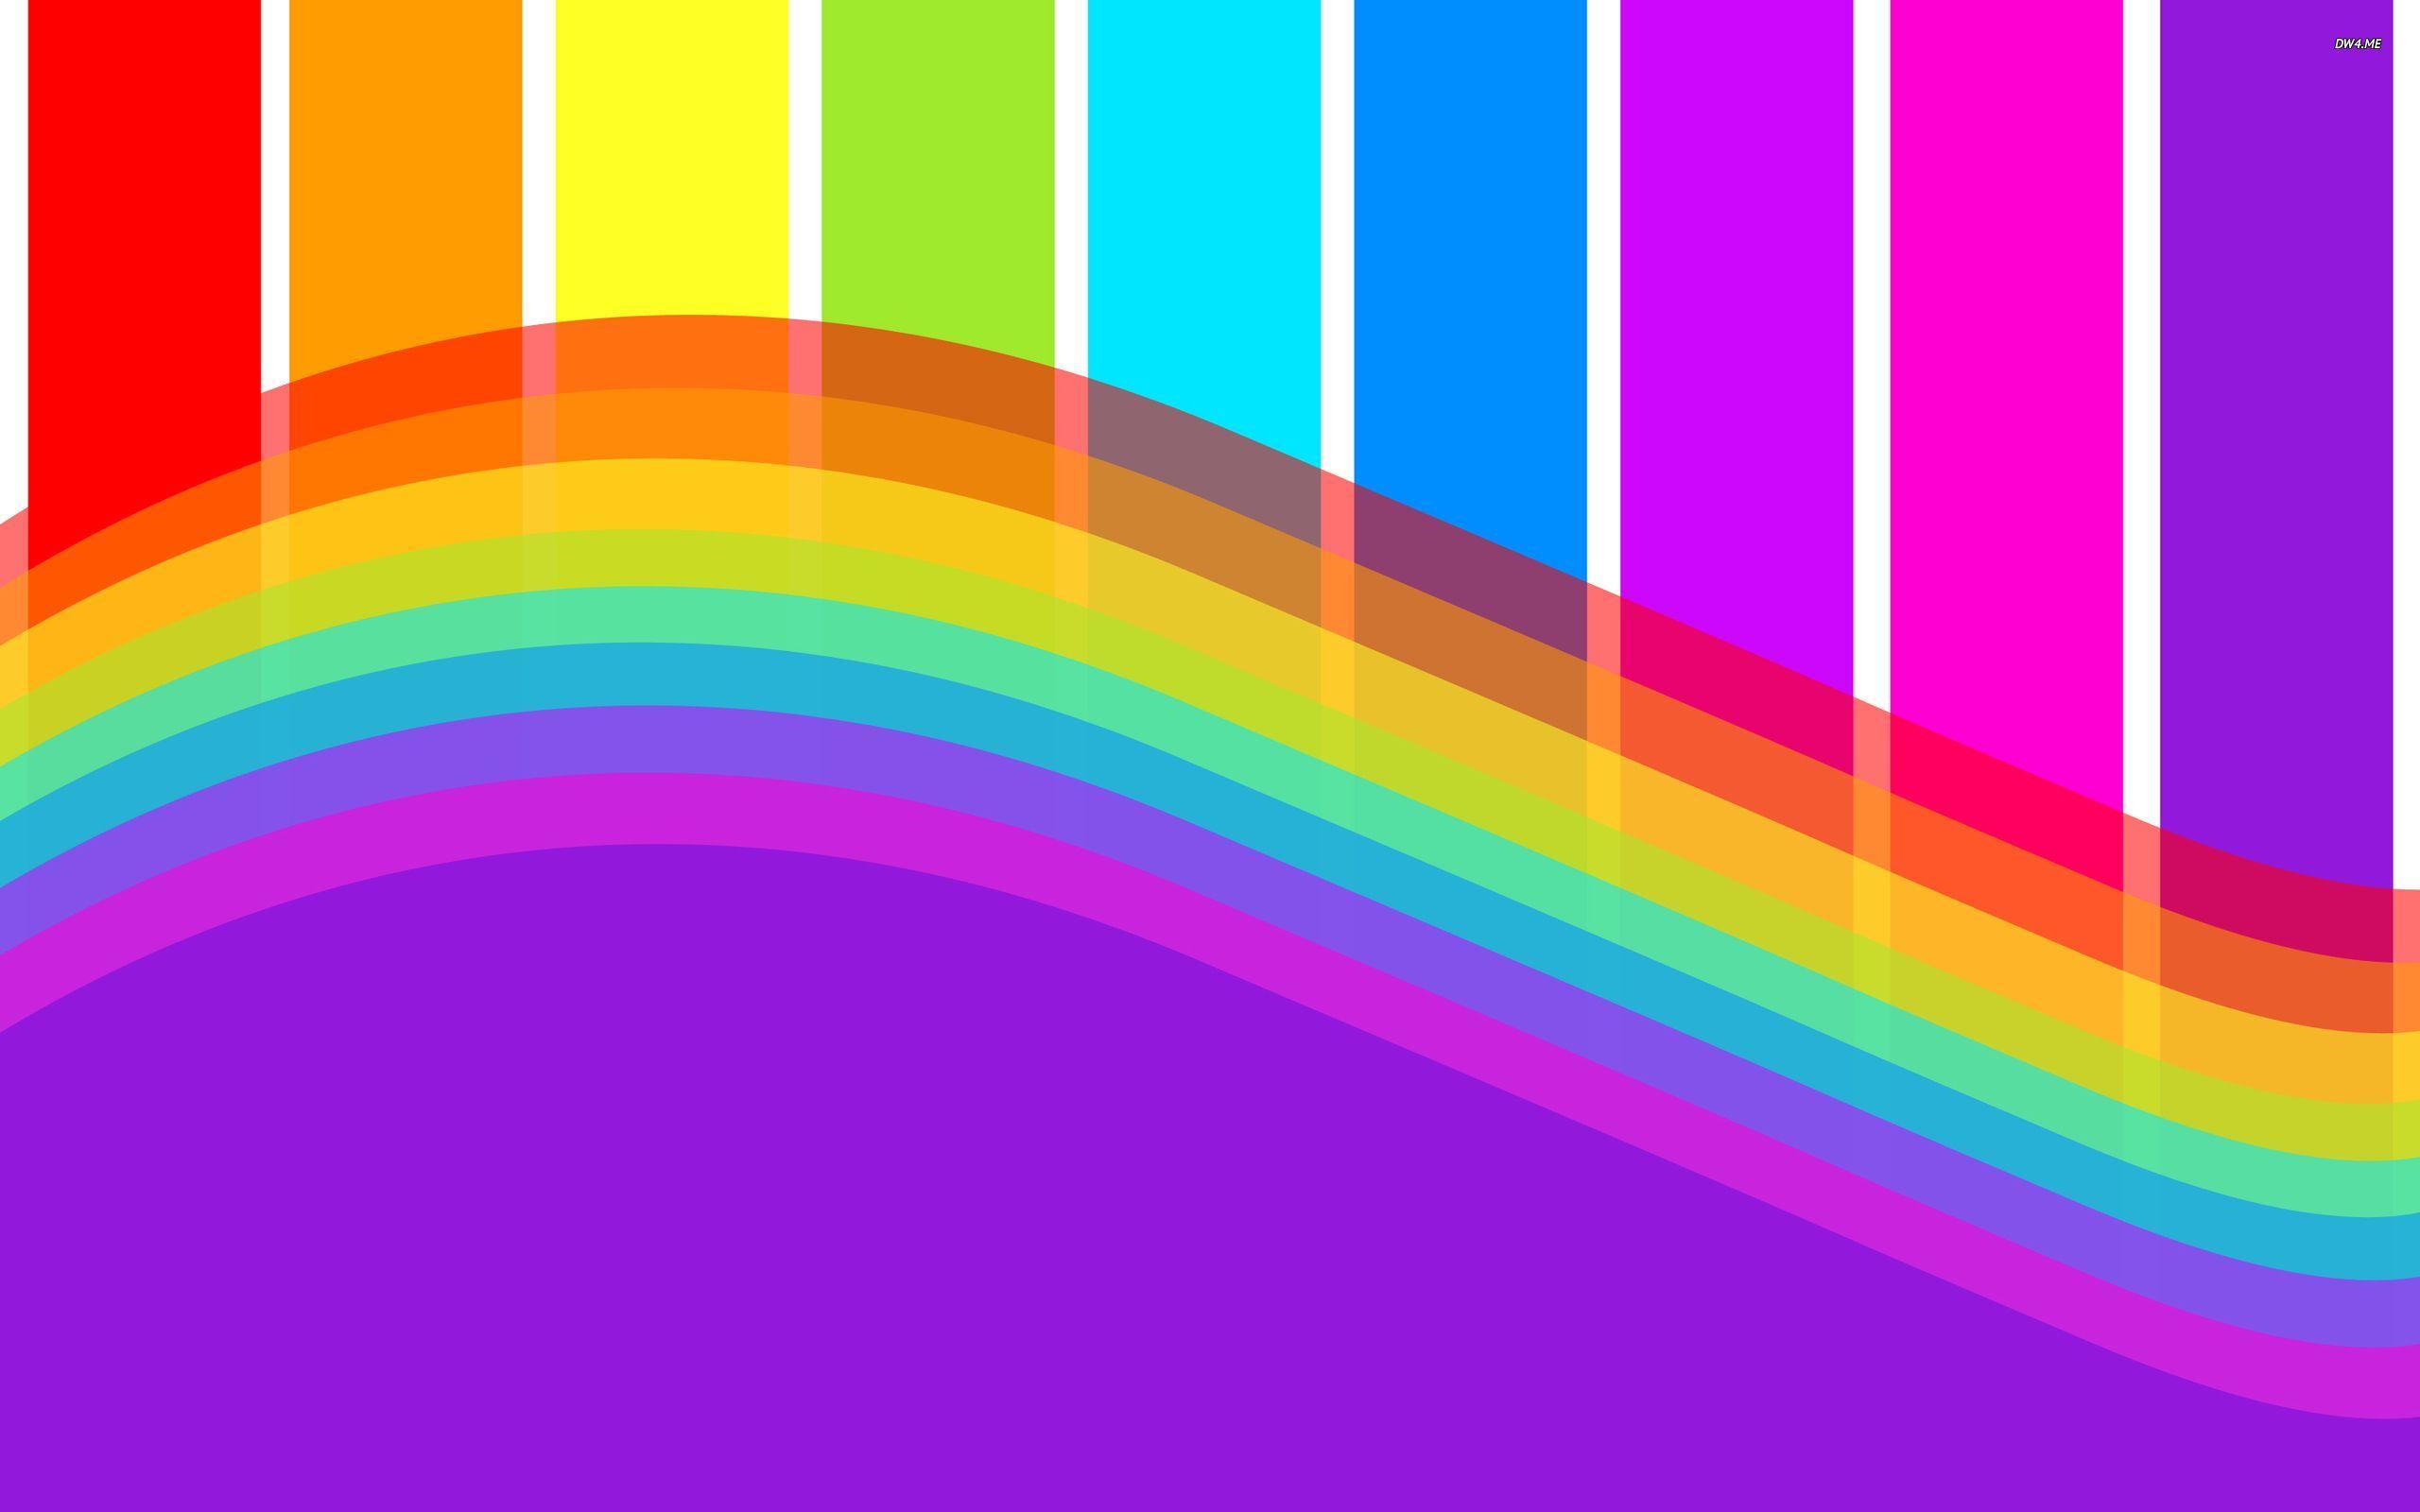 rainbow stripes wallpapers top free rainbow stripes backgrounds wallpaperaccess rainbow stripes wallpapers top free